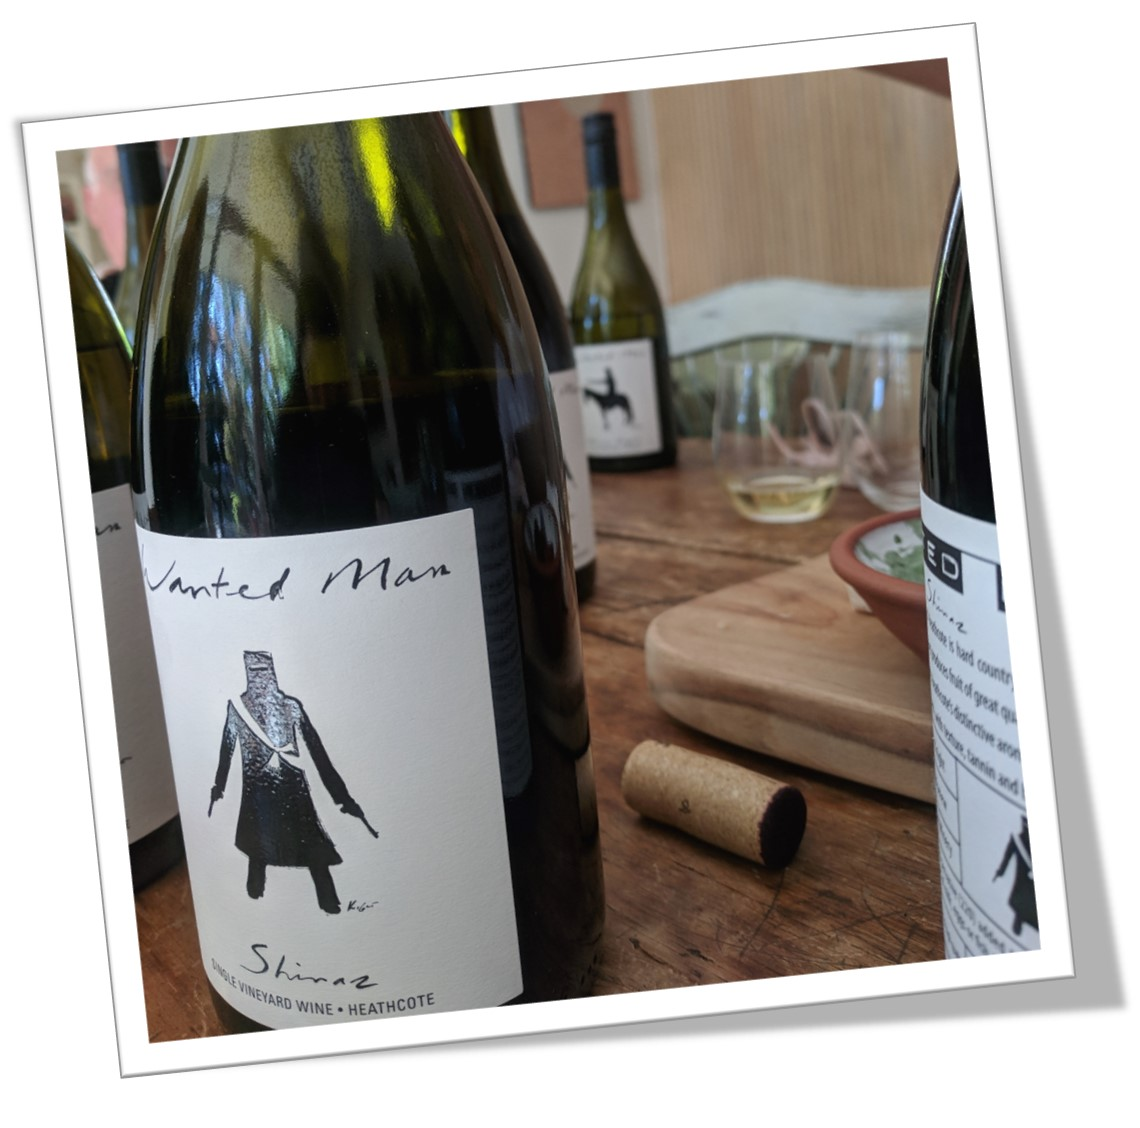 Single vineyard shiraz